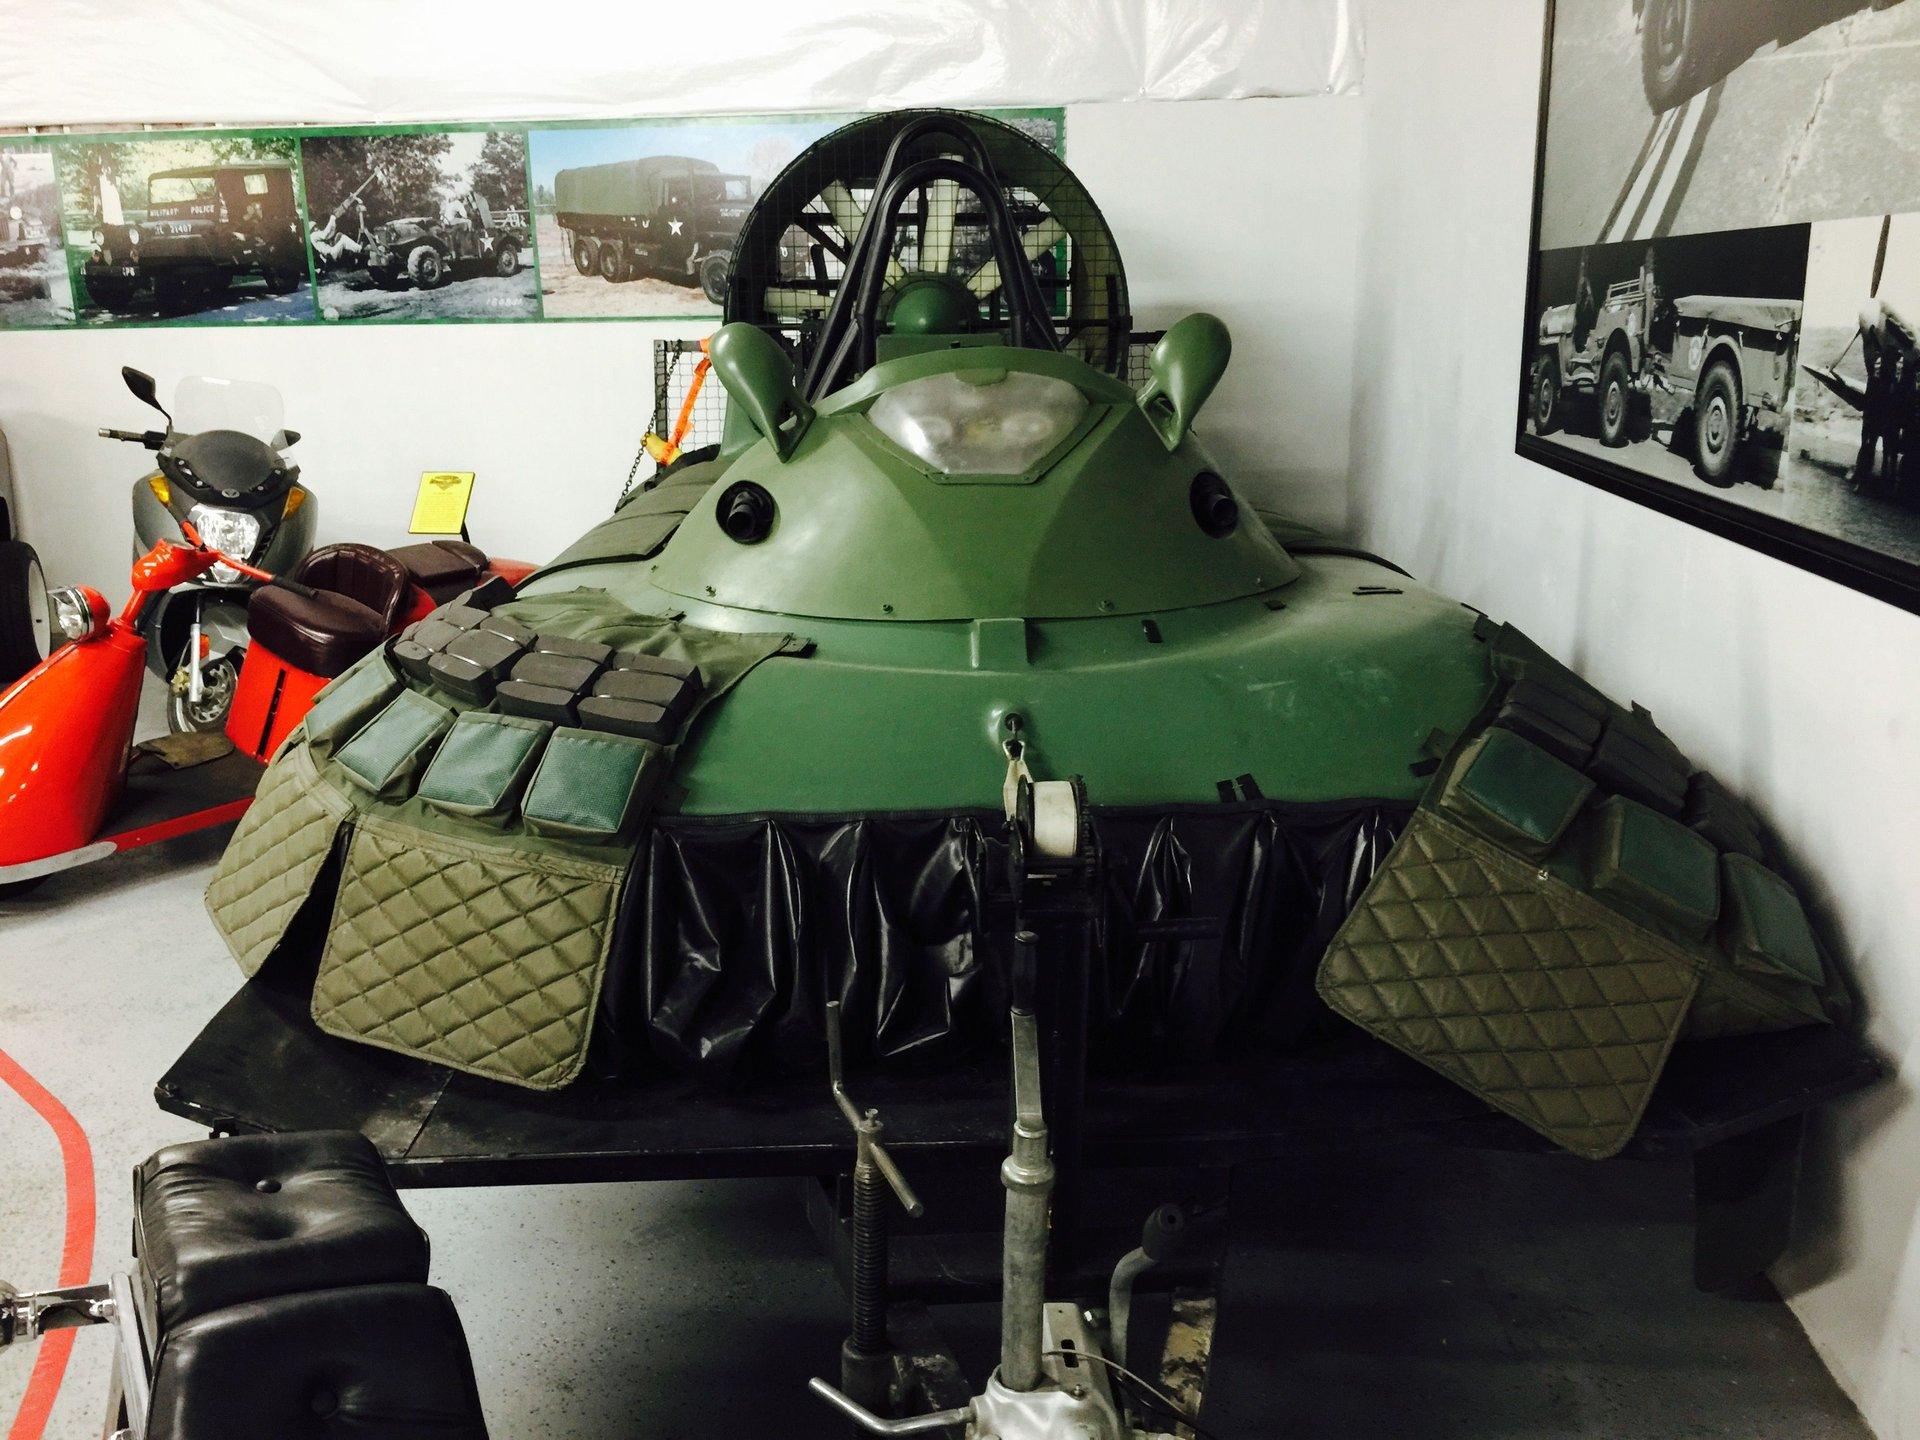 Hovercraft prop